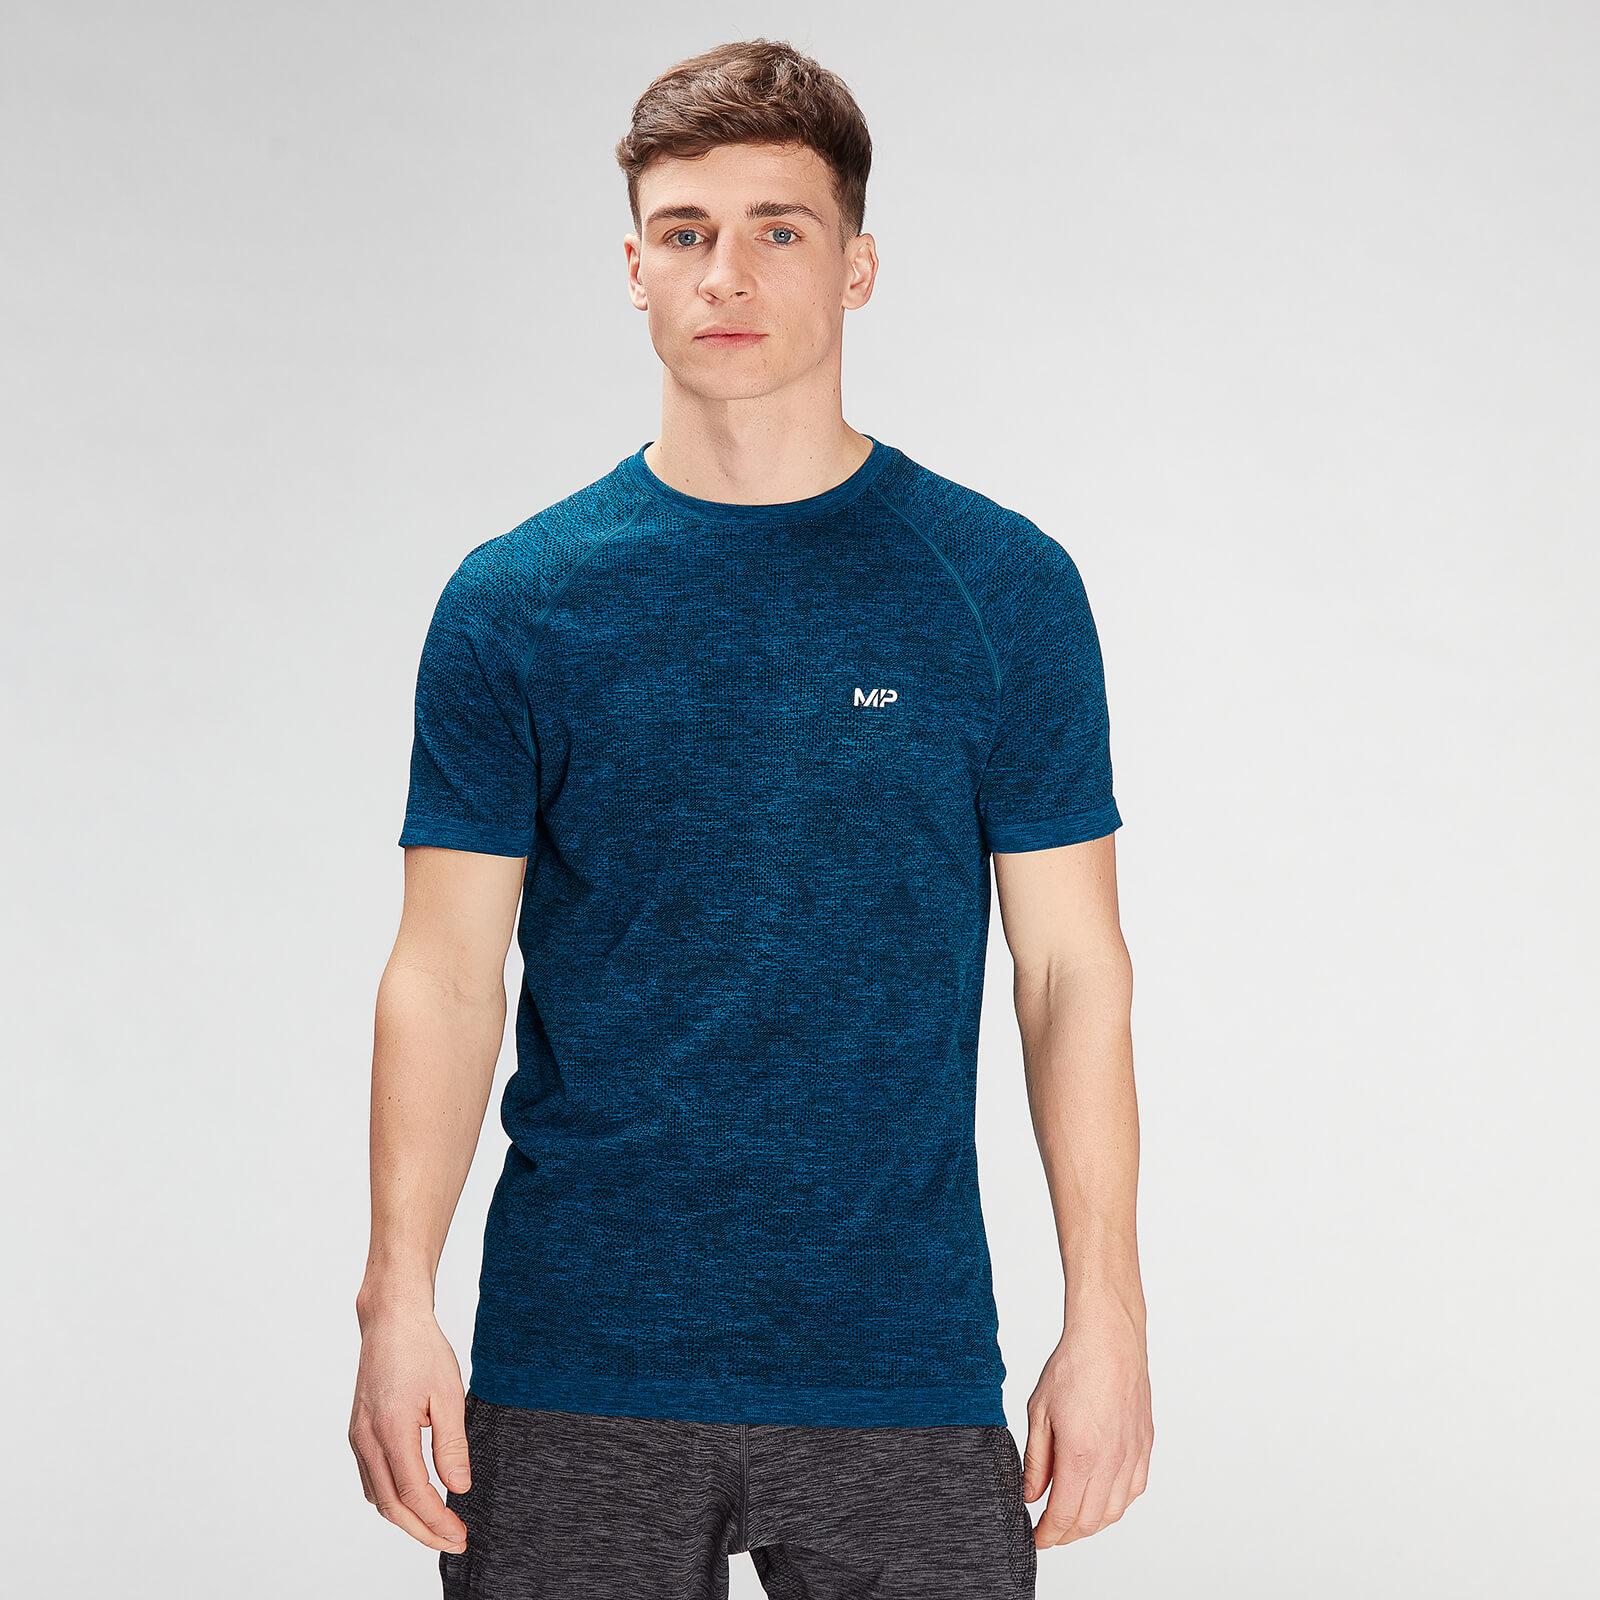 Купить MP Men's Essential Seamless Graphic Short Sleeve T-Shirt- Aqua - XS, Myprotein International